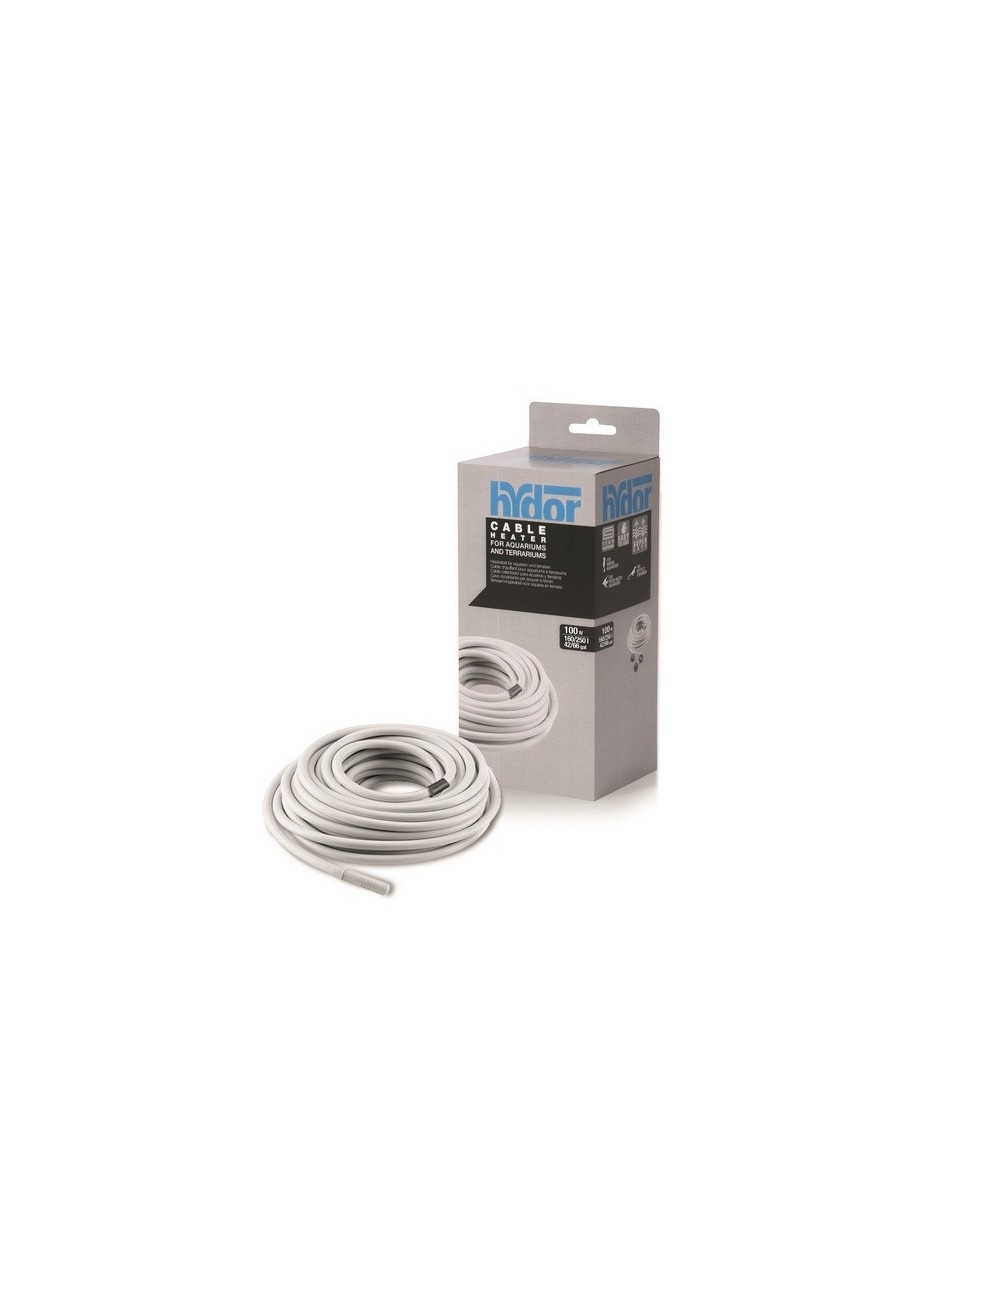 HYDOR - Hydro Kable - 75w - Câble chauffant pour aquarium